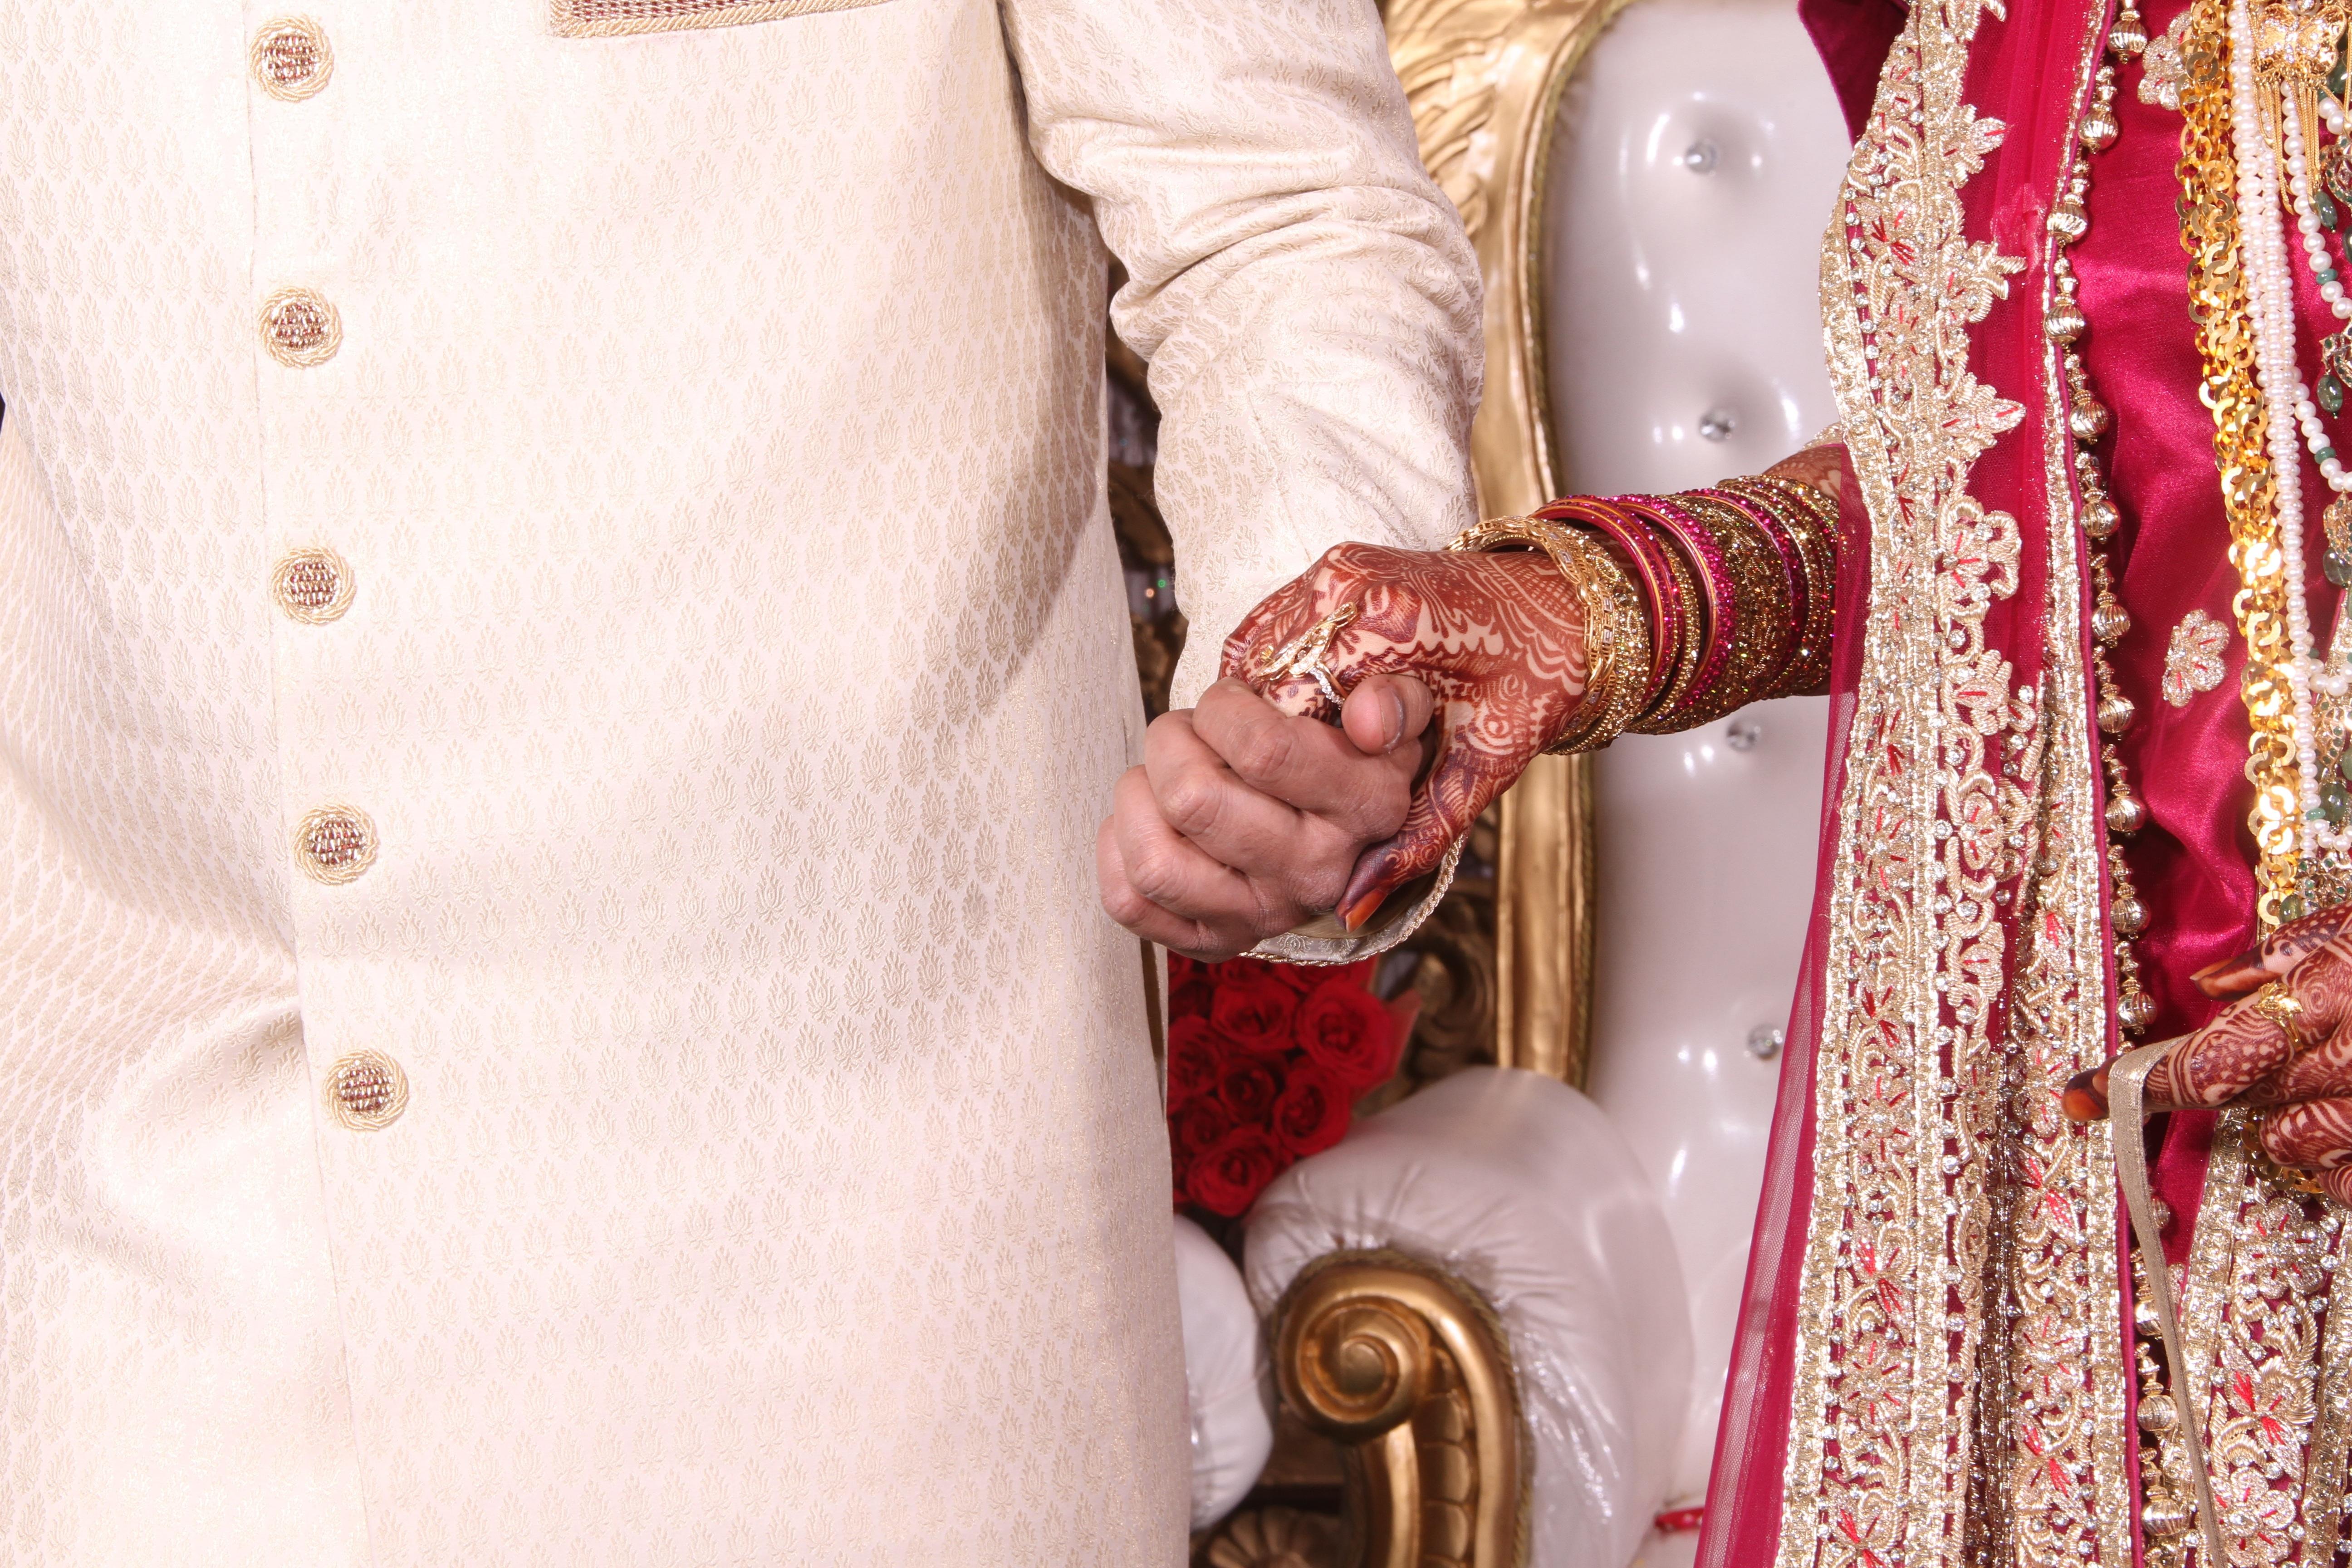 Gambar Cinta Pola Inai Warna Warni Sepasang Bersama Berwarna